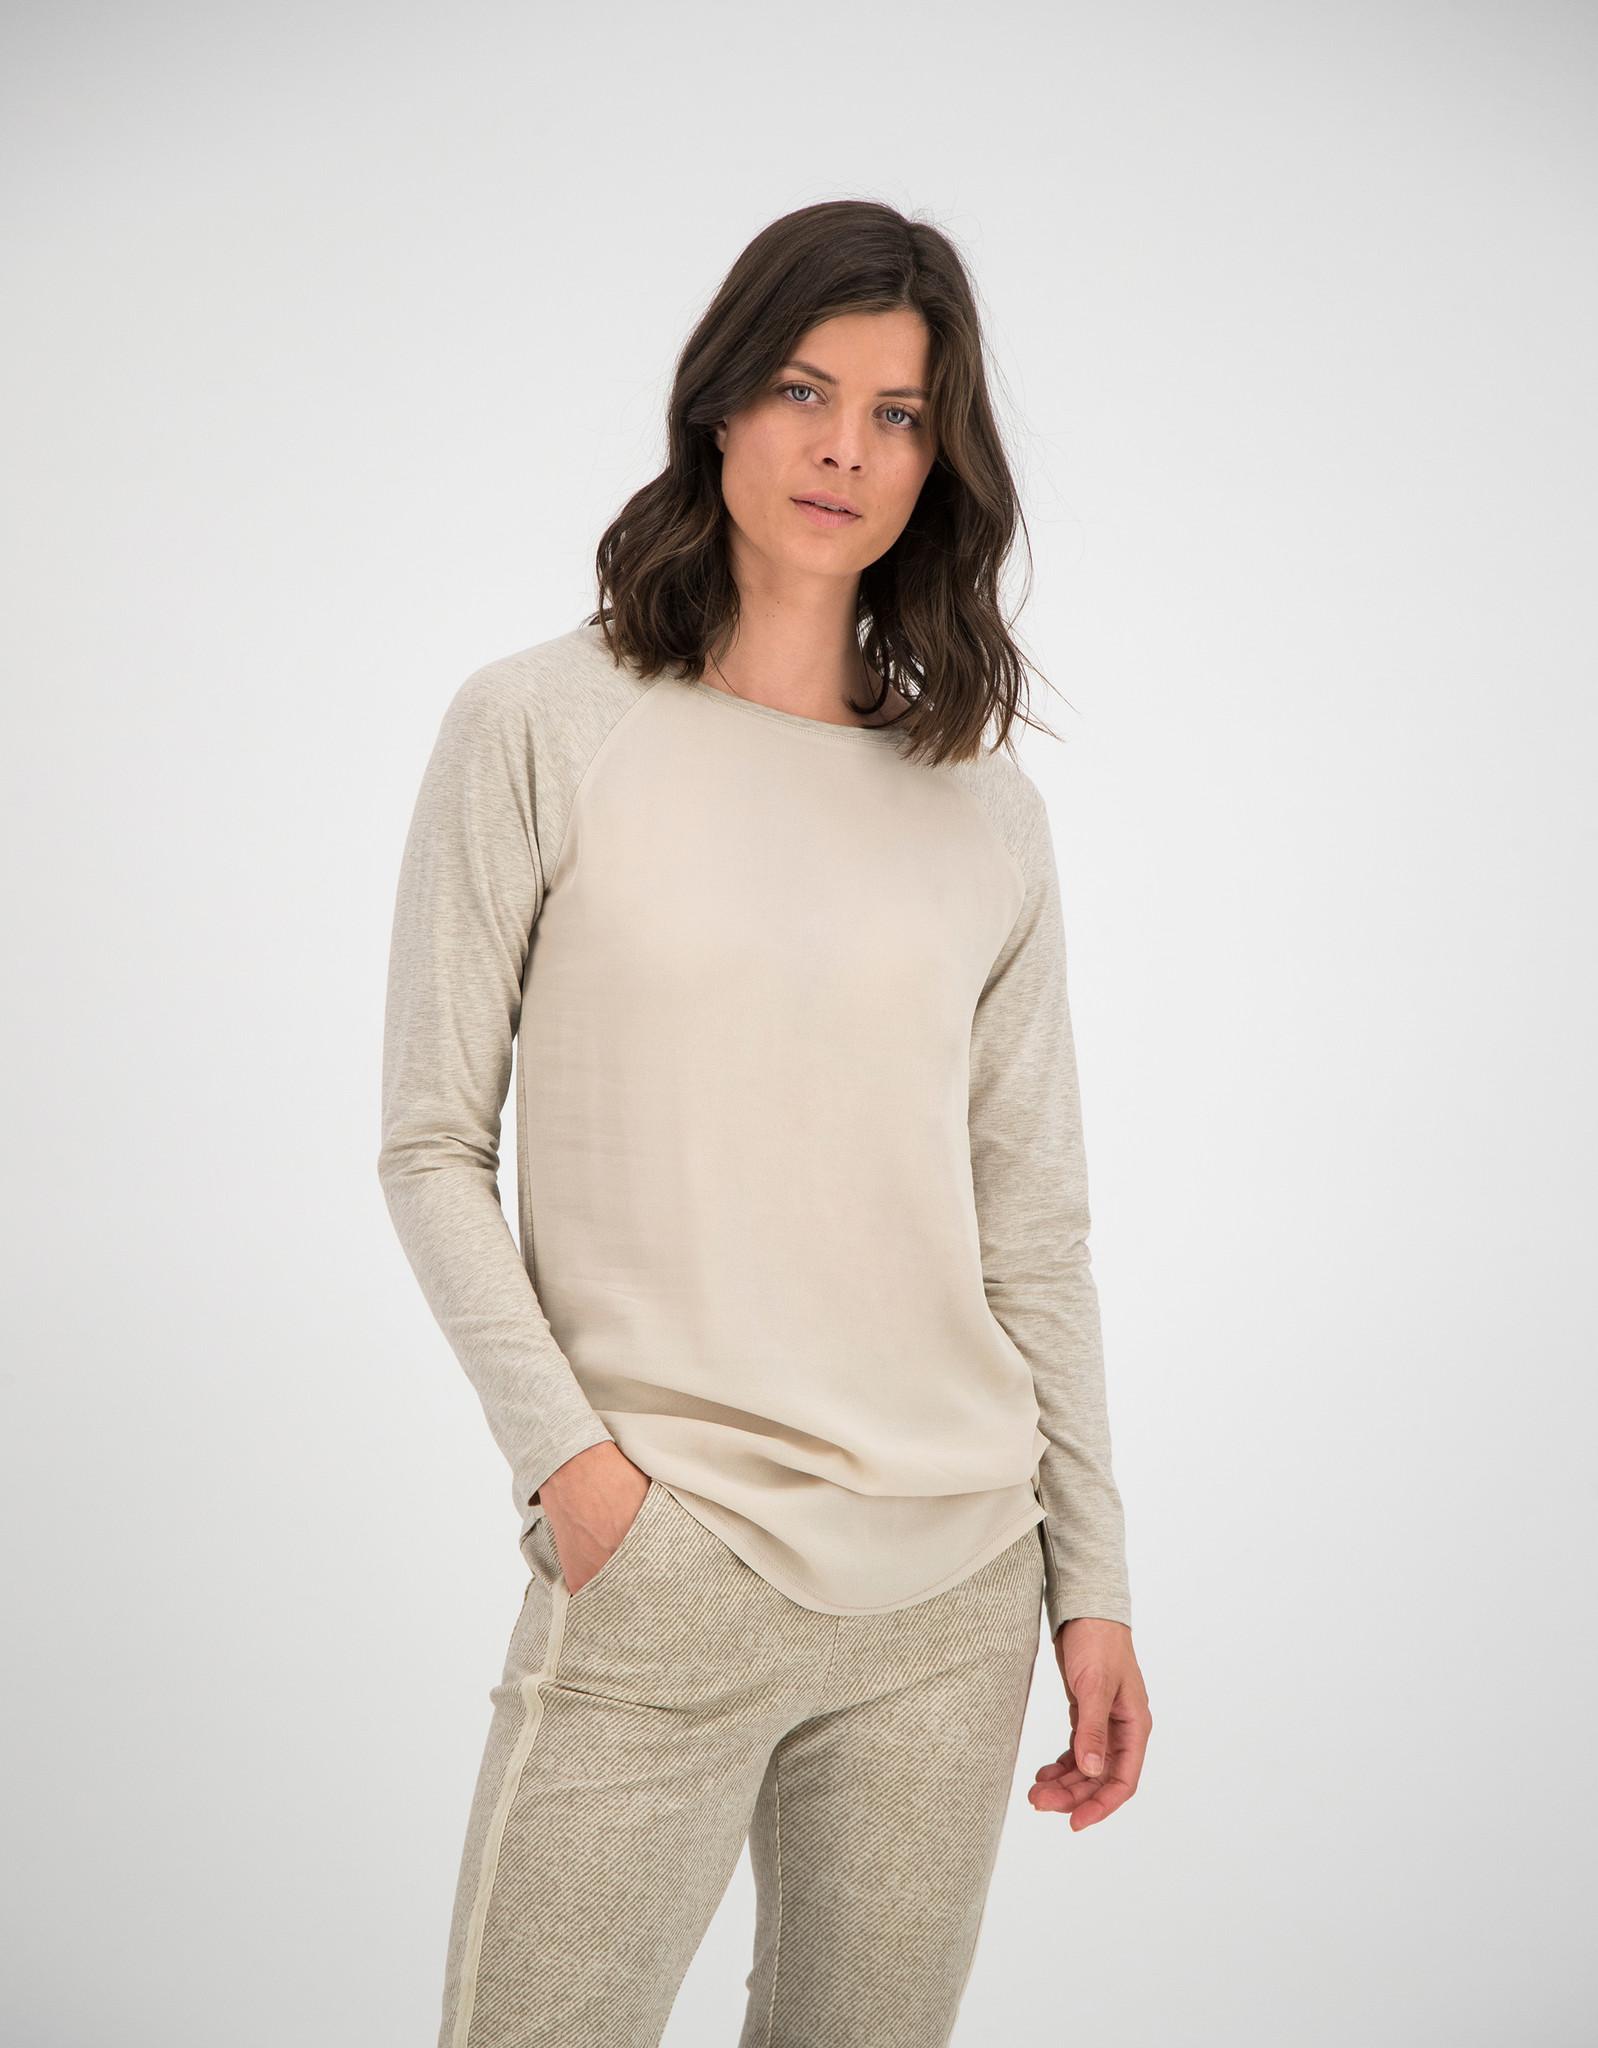 SYLVER Cotton Elastane Shirt Long Sleeve - Oatmeal